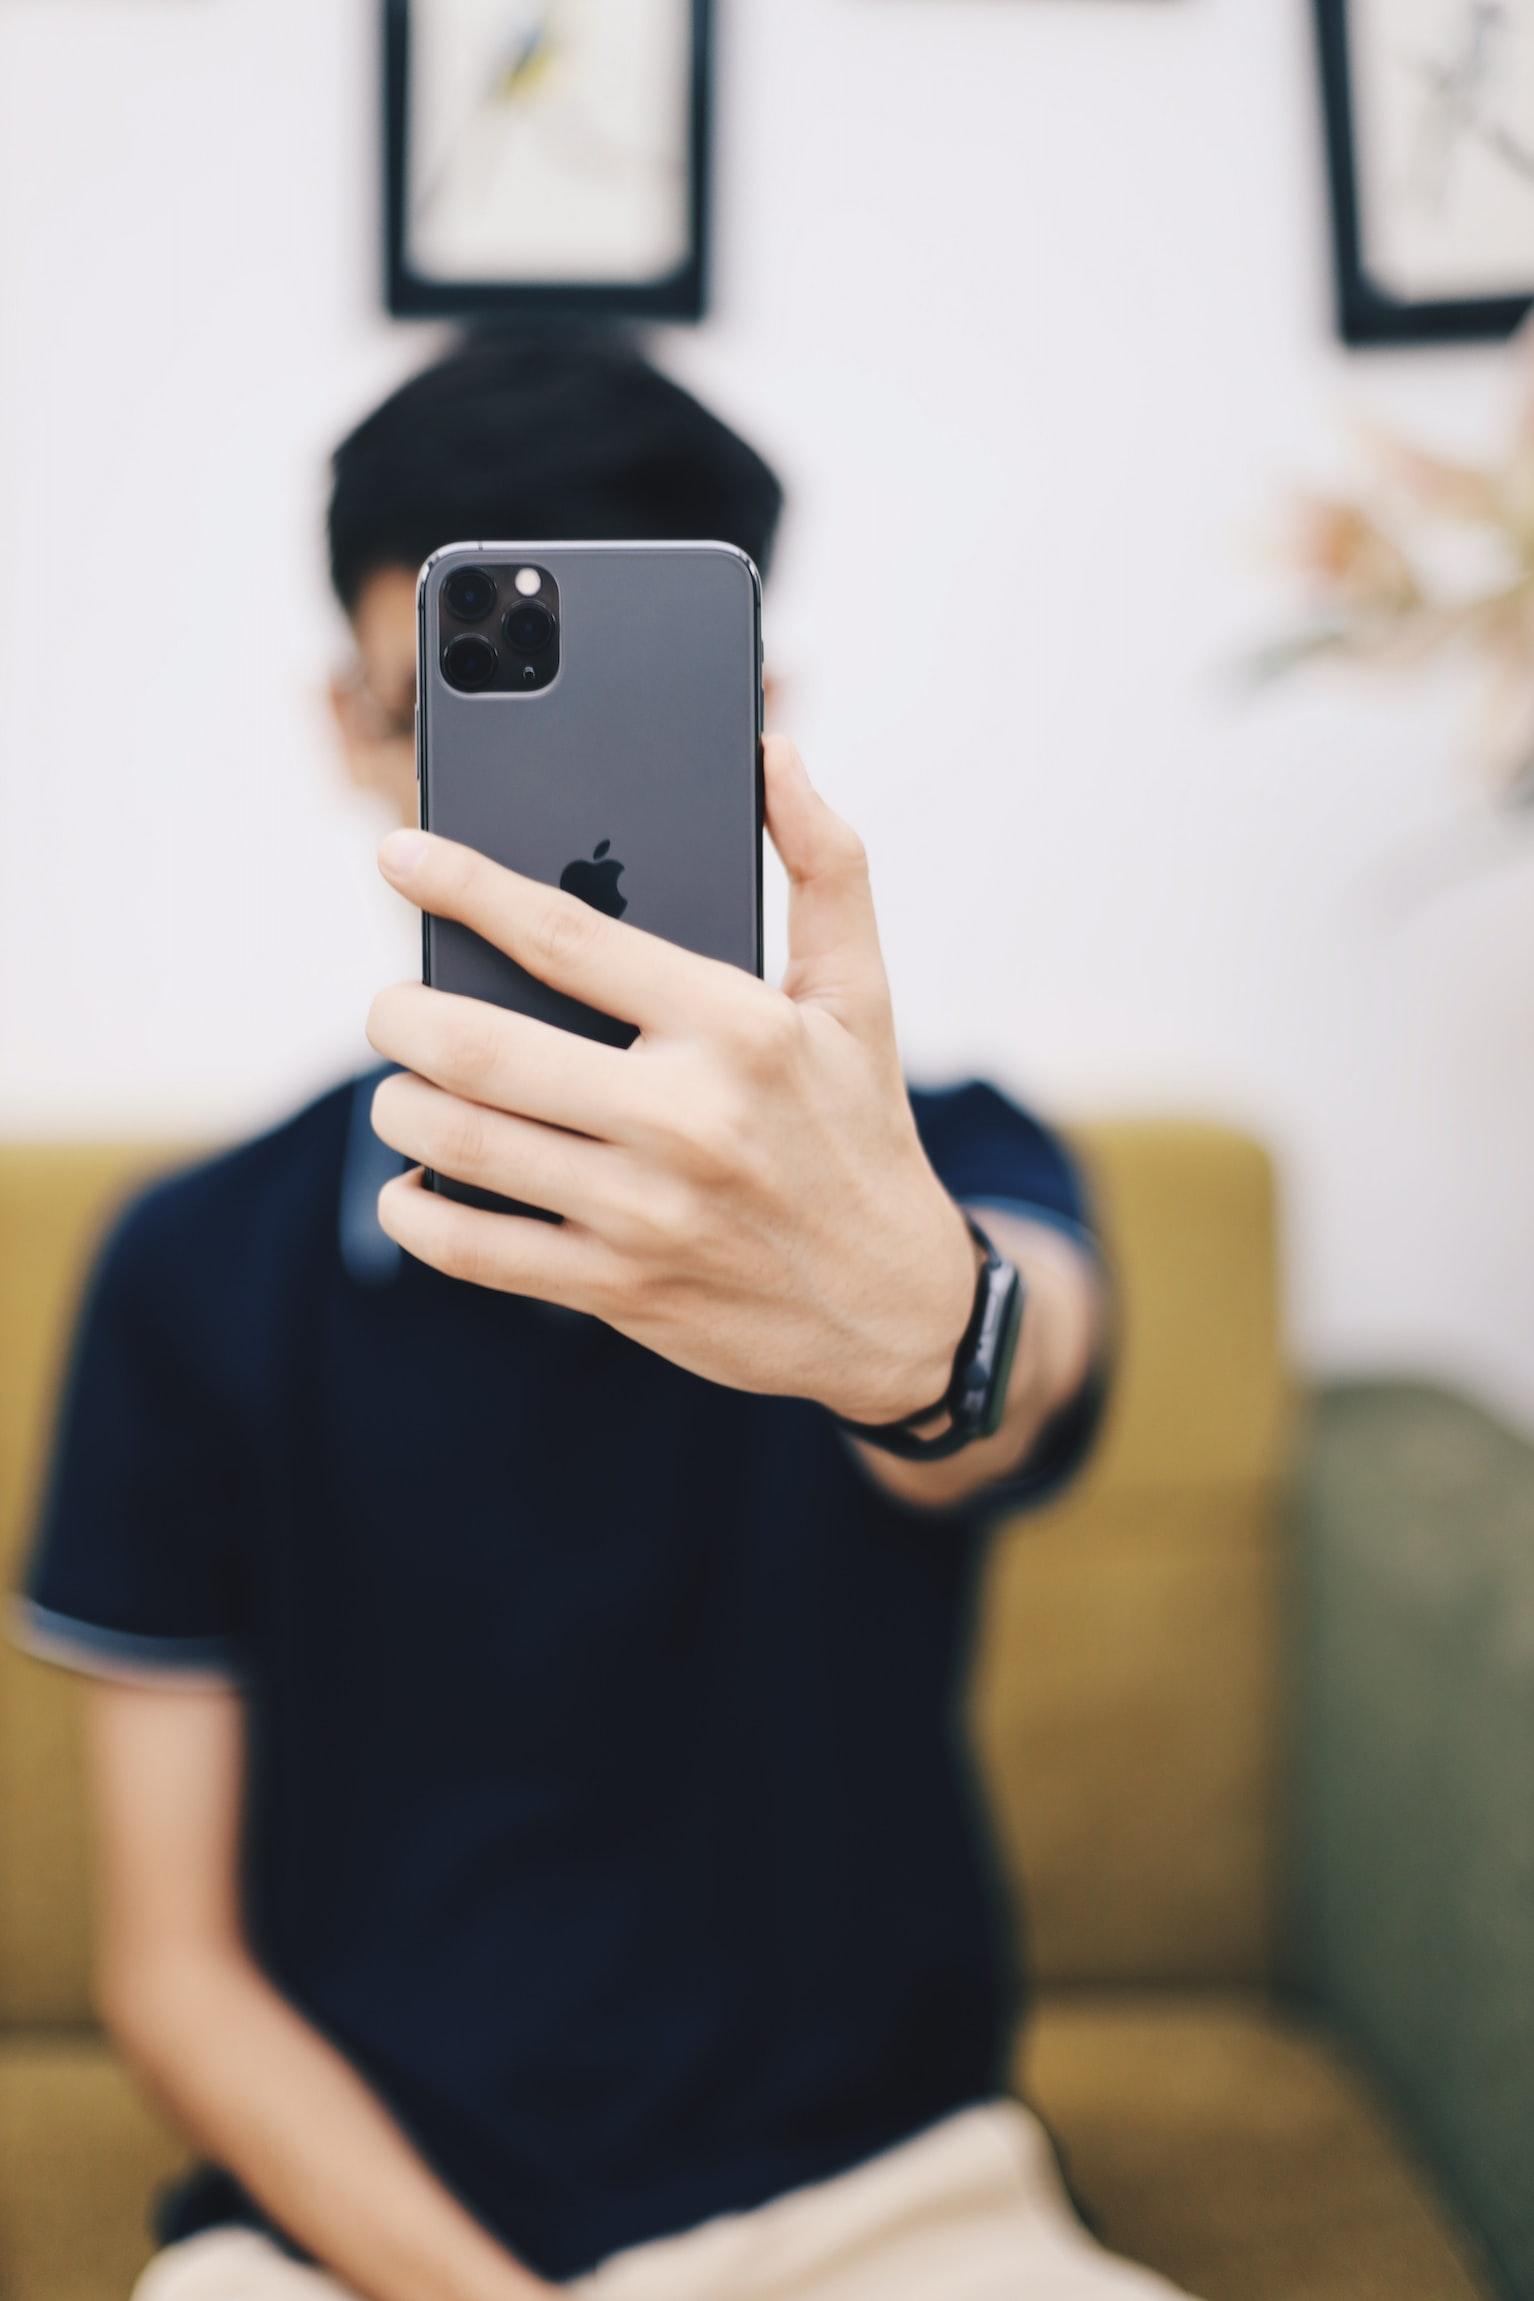 ¿Se escribe selfie o selfi?